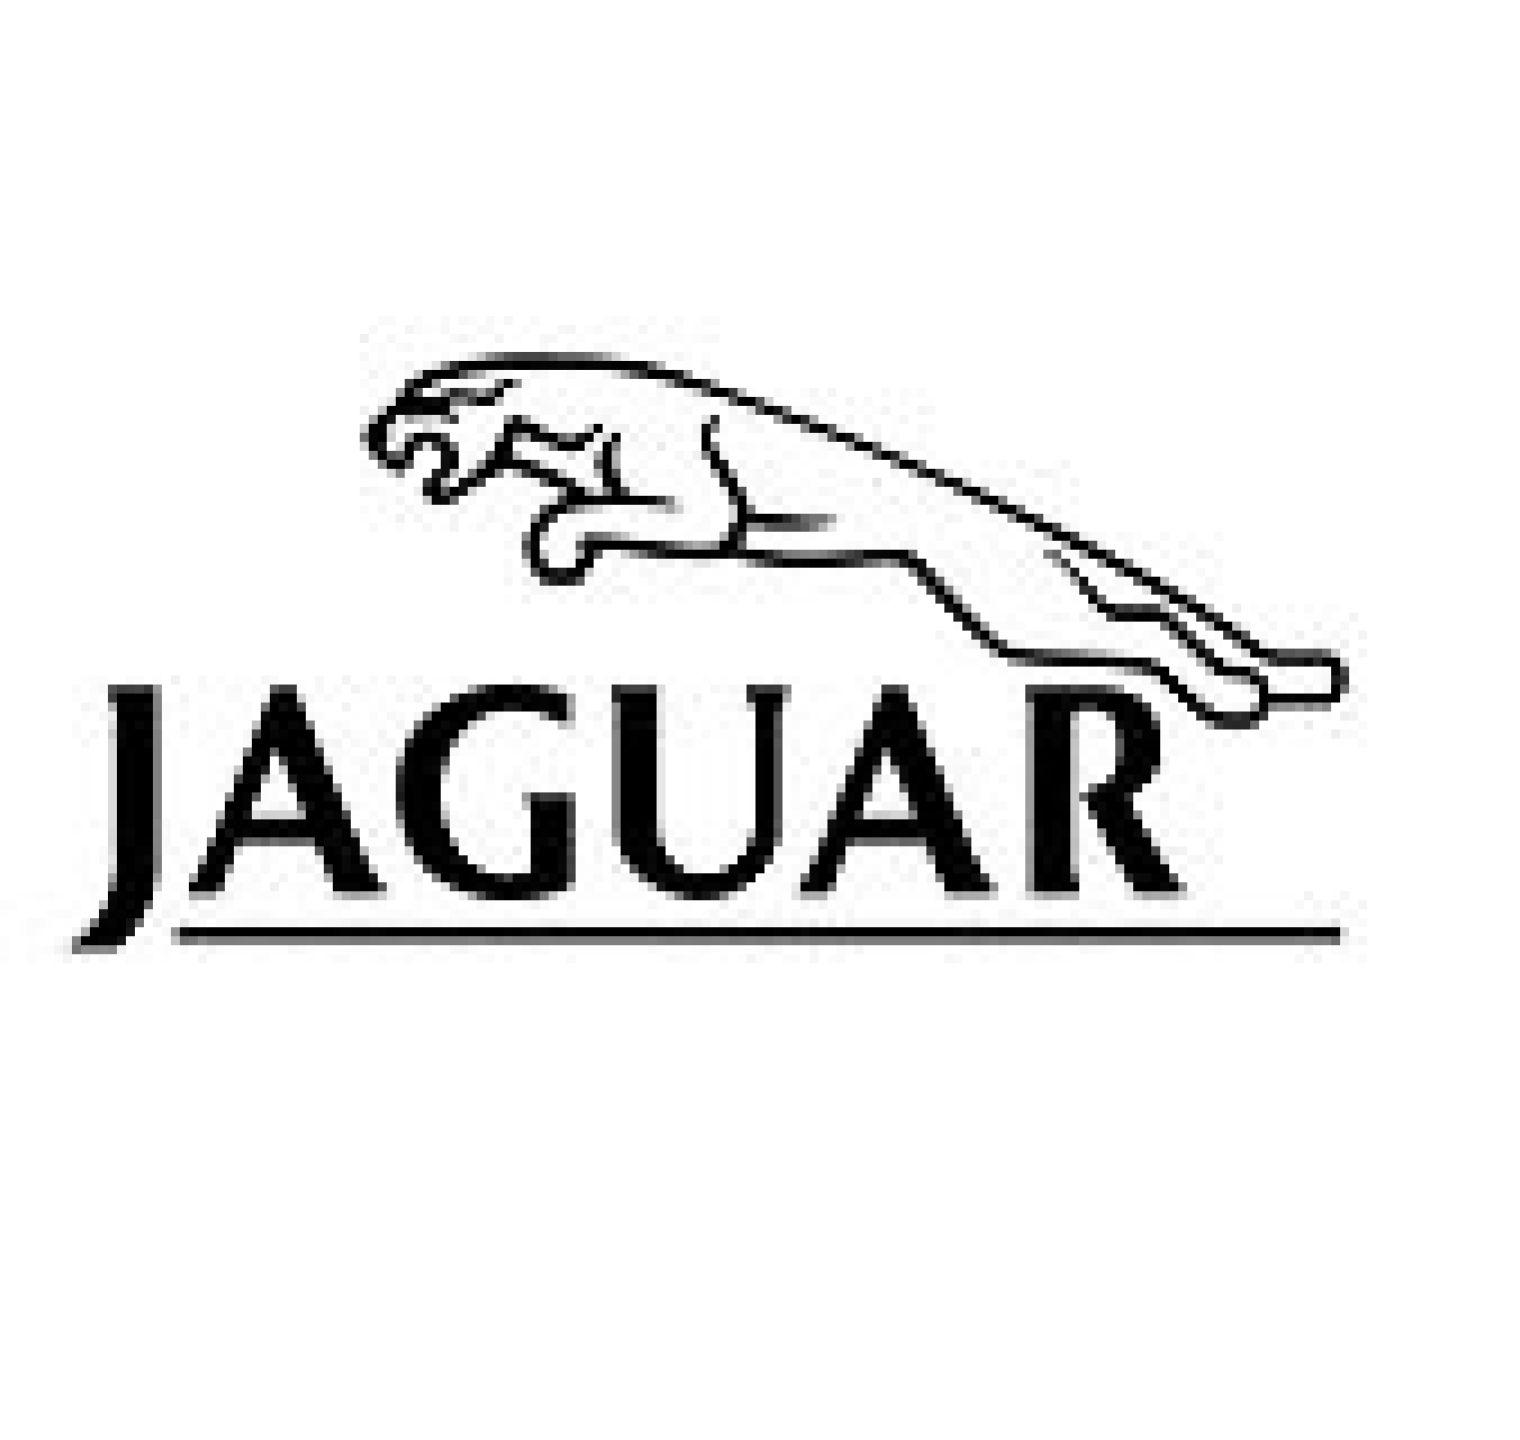 Jaguar Xf (vanaf 2015) - set ruitenwissers Valeo Hydroconnect